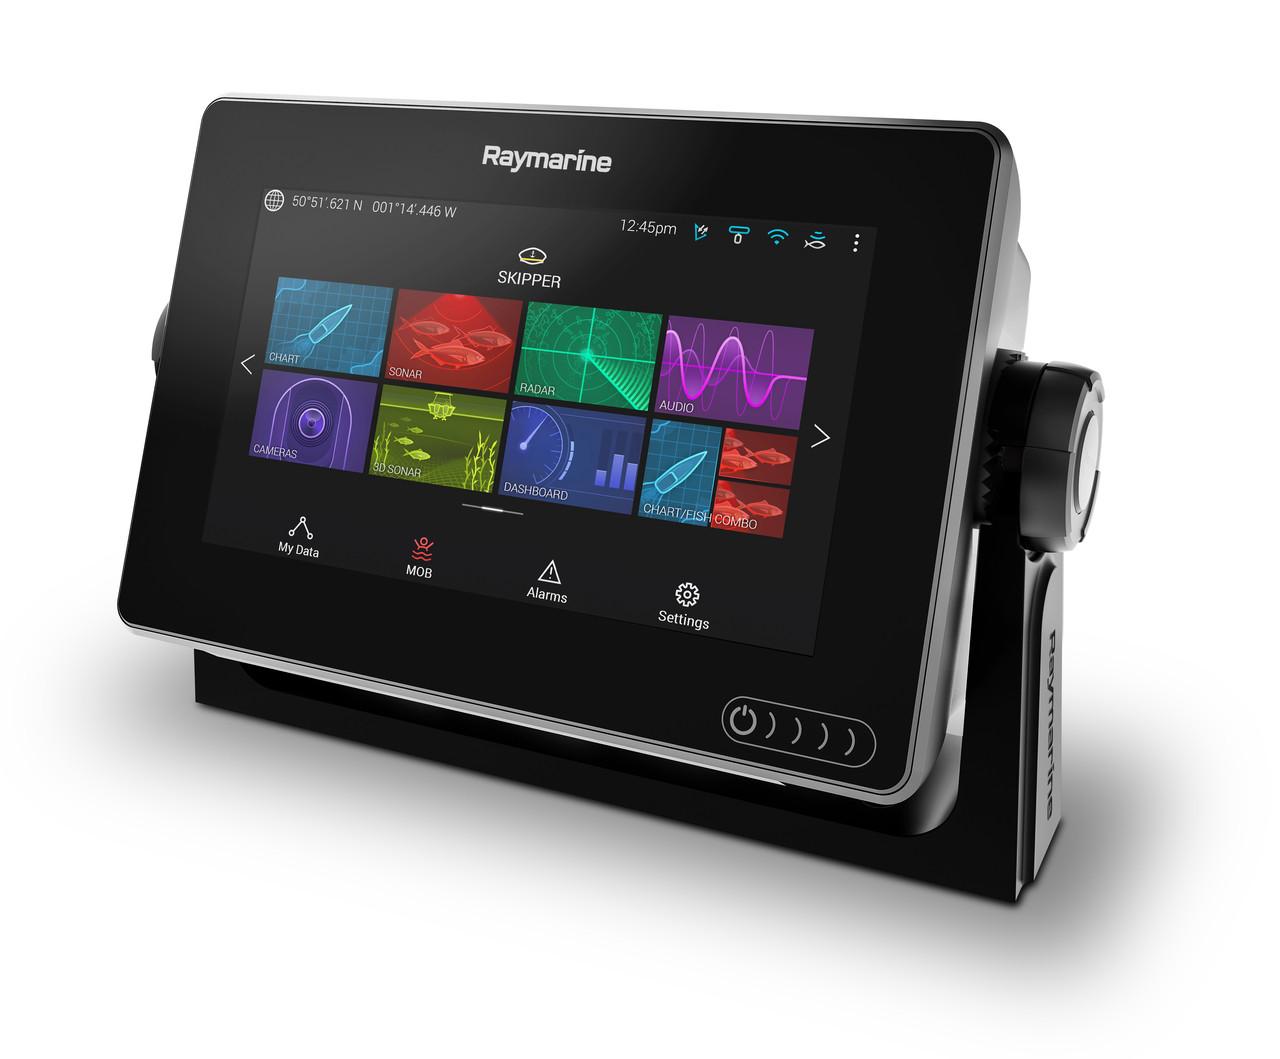 Raymarine Axiom 7 Multifunction Display Right Angle View